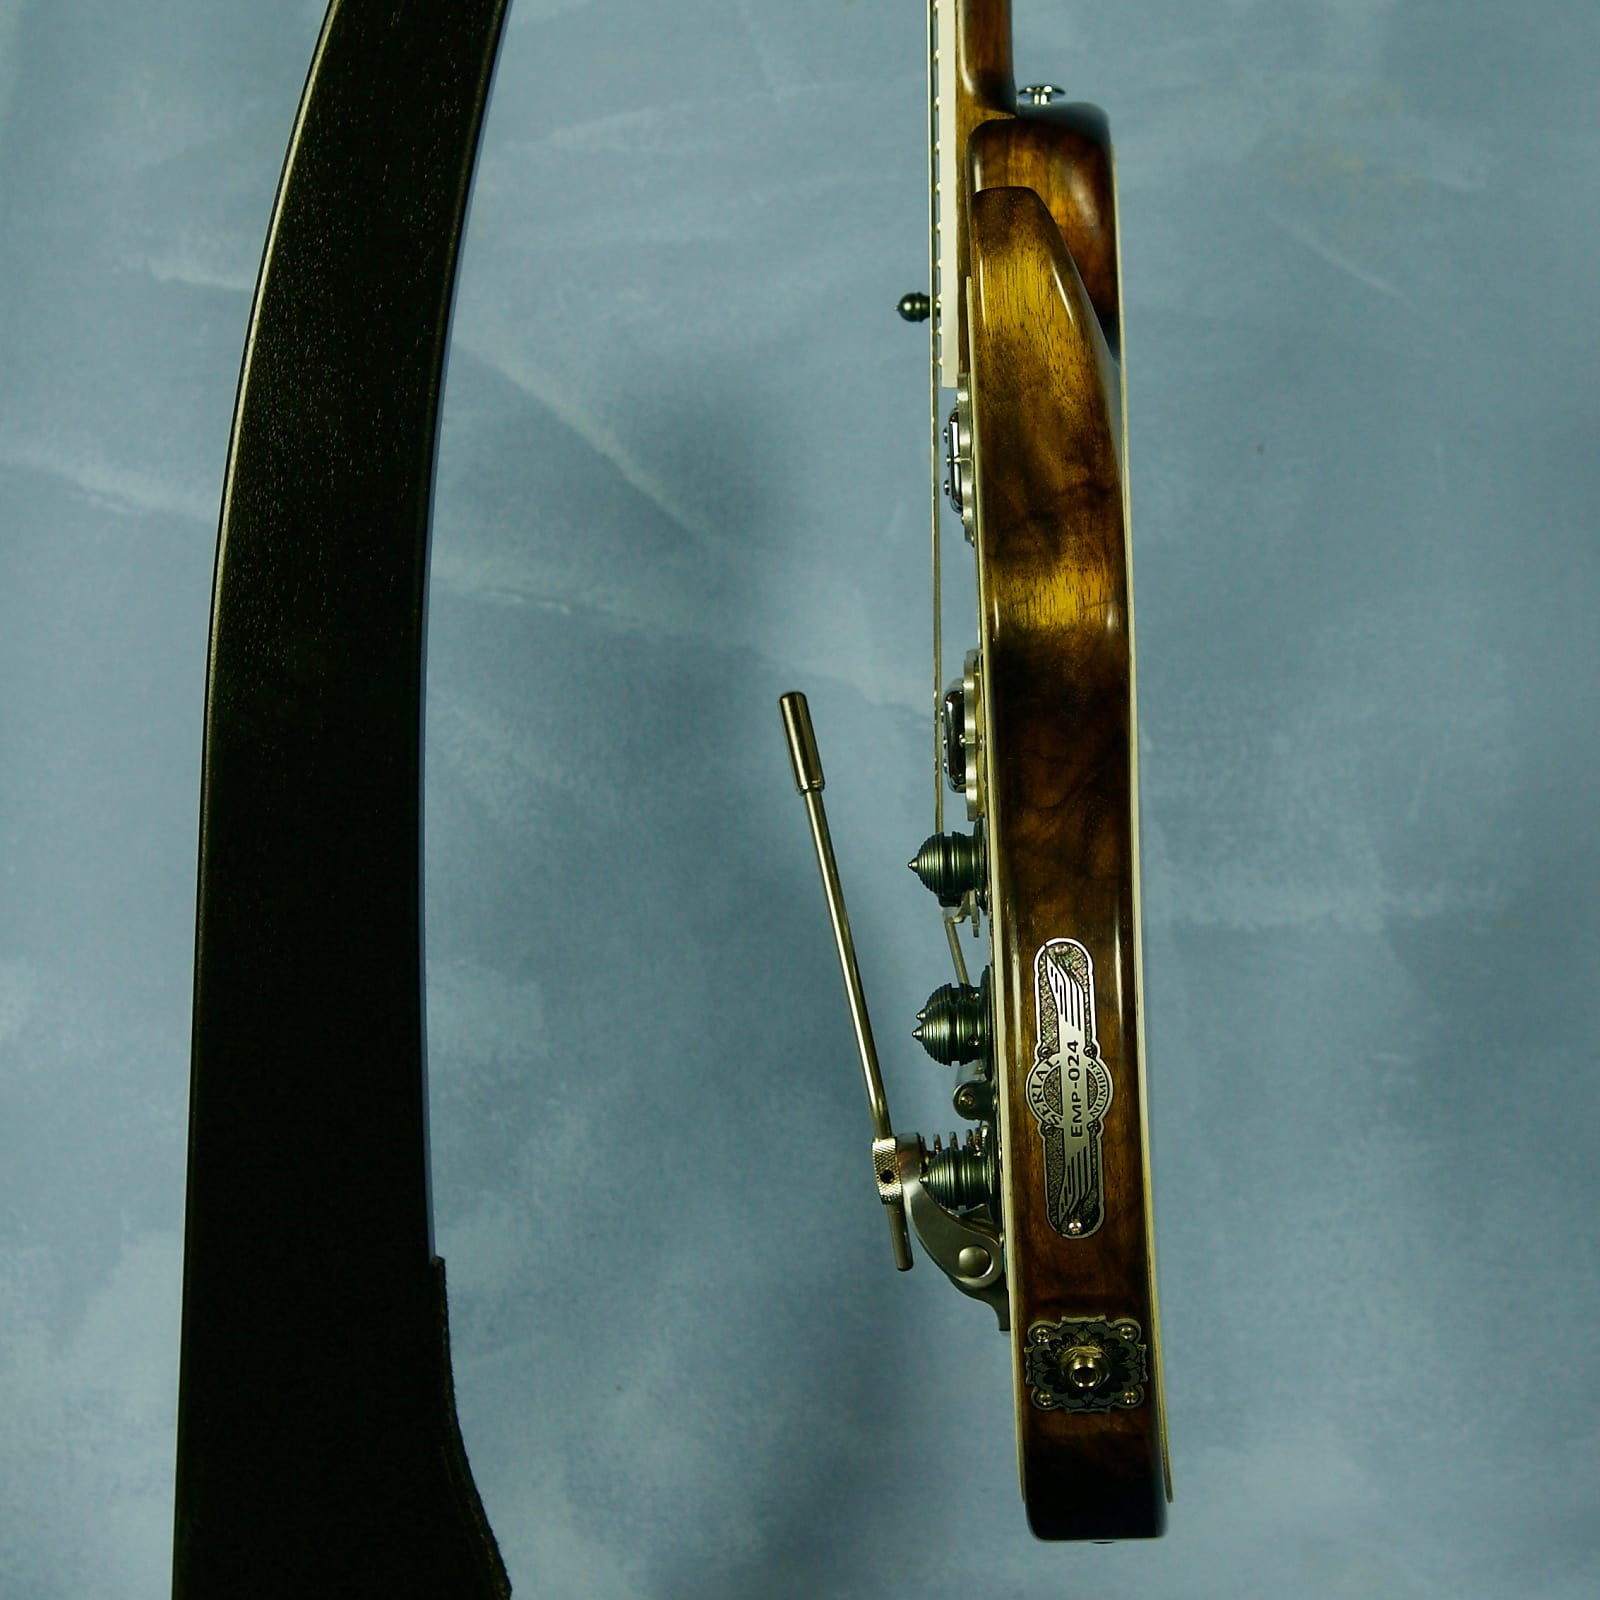 Teye Jazz Cat Emperor Series Shipwreck